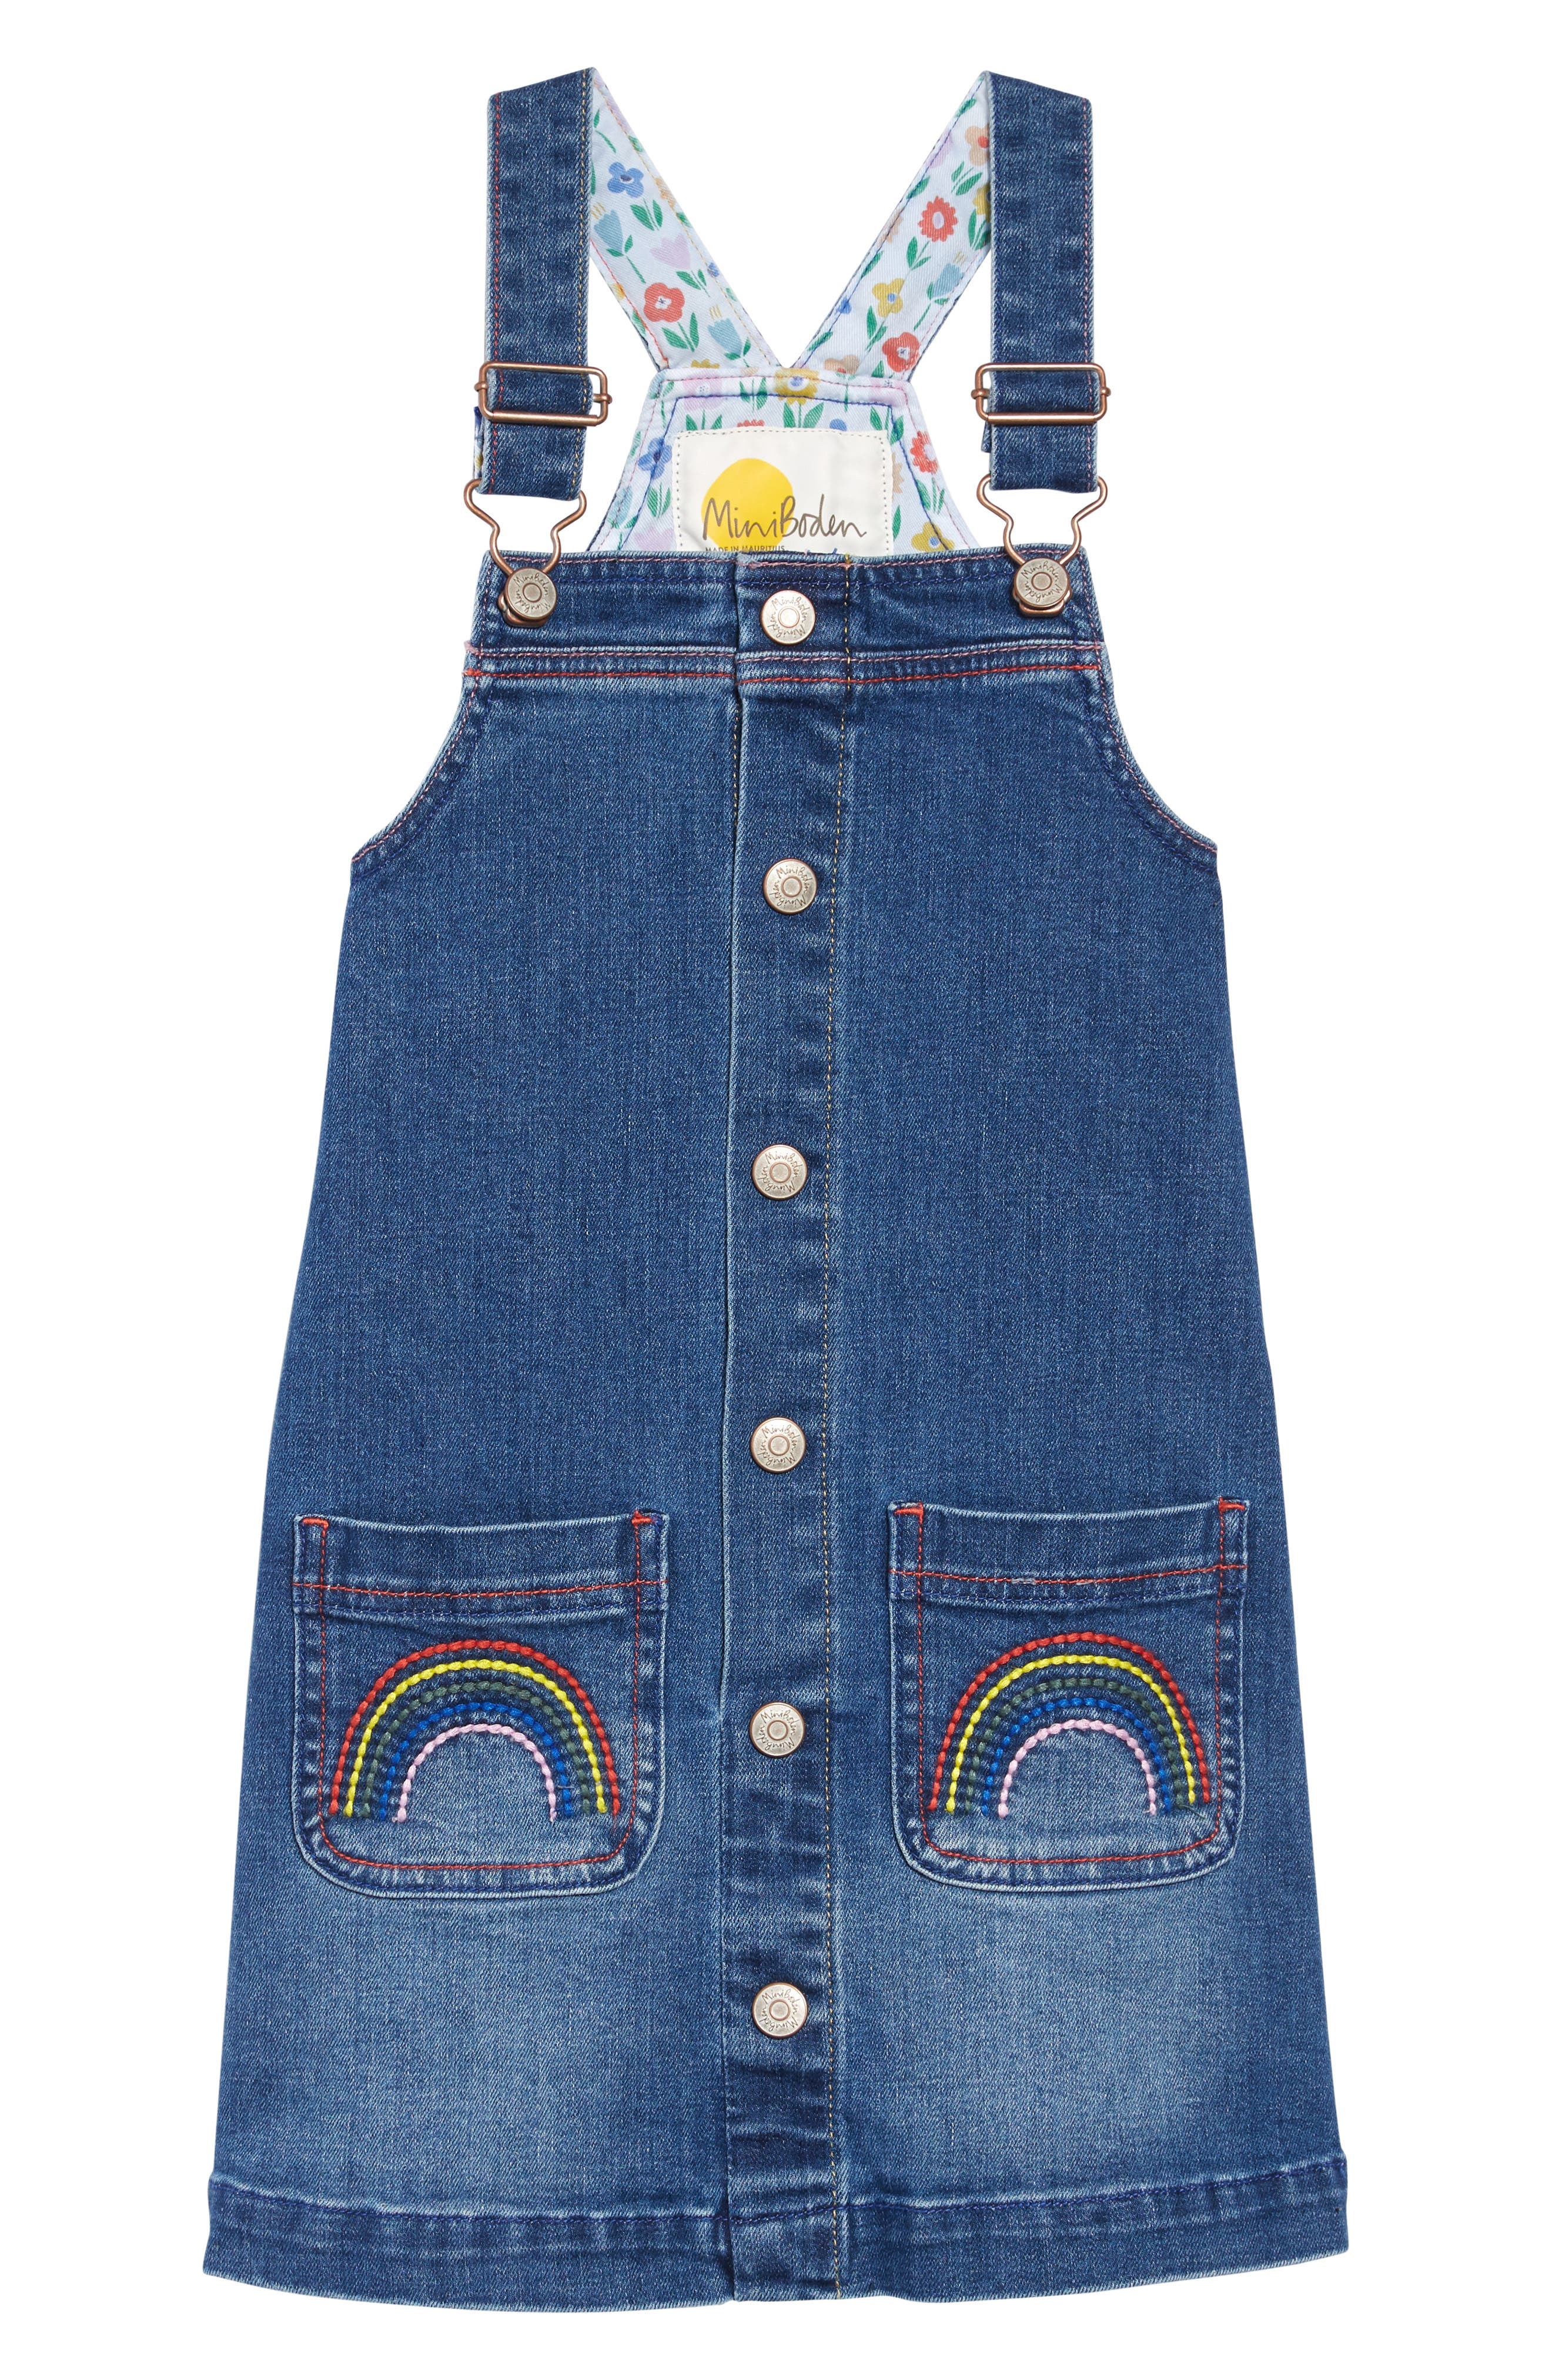 BODEN,                             Mini Boden Denim Dungaree Overall Dress,                             Main thumbnail 1, color,                             LIGHT VINTAGE BLUE RAINBOWS